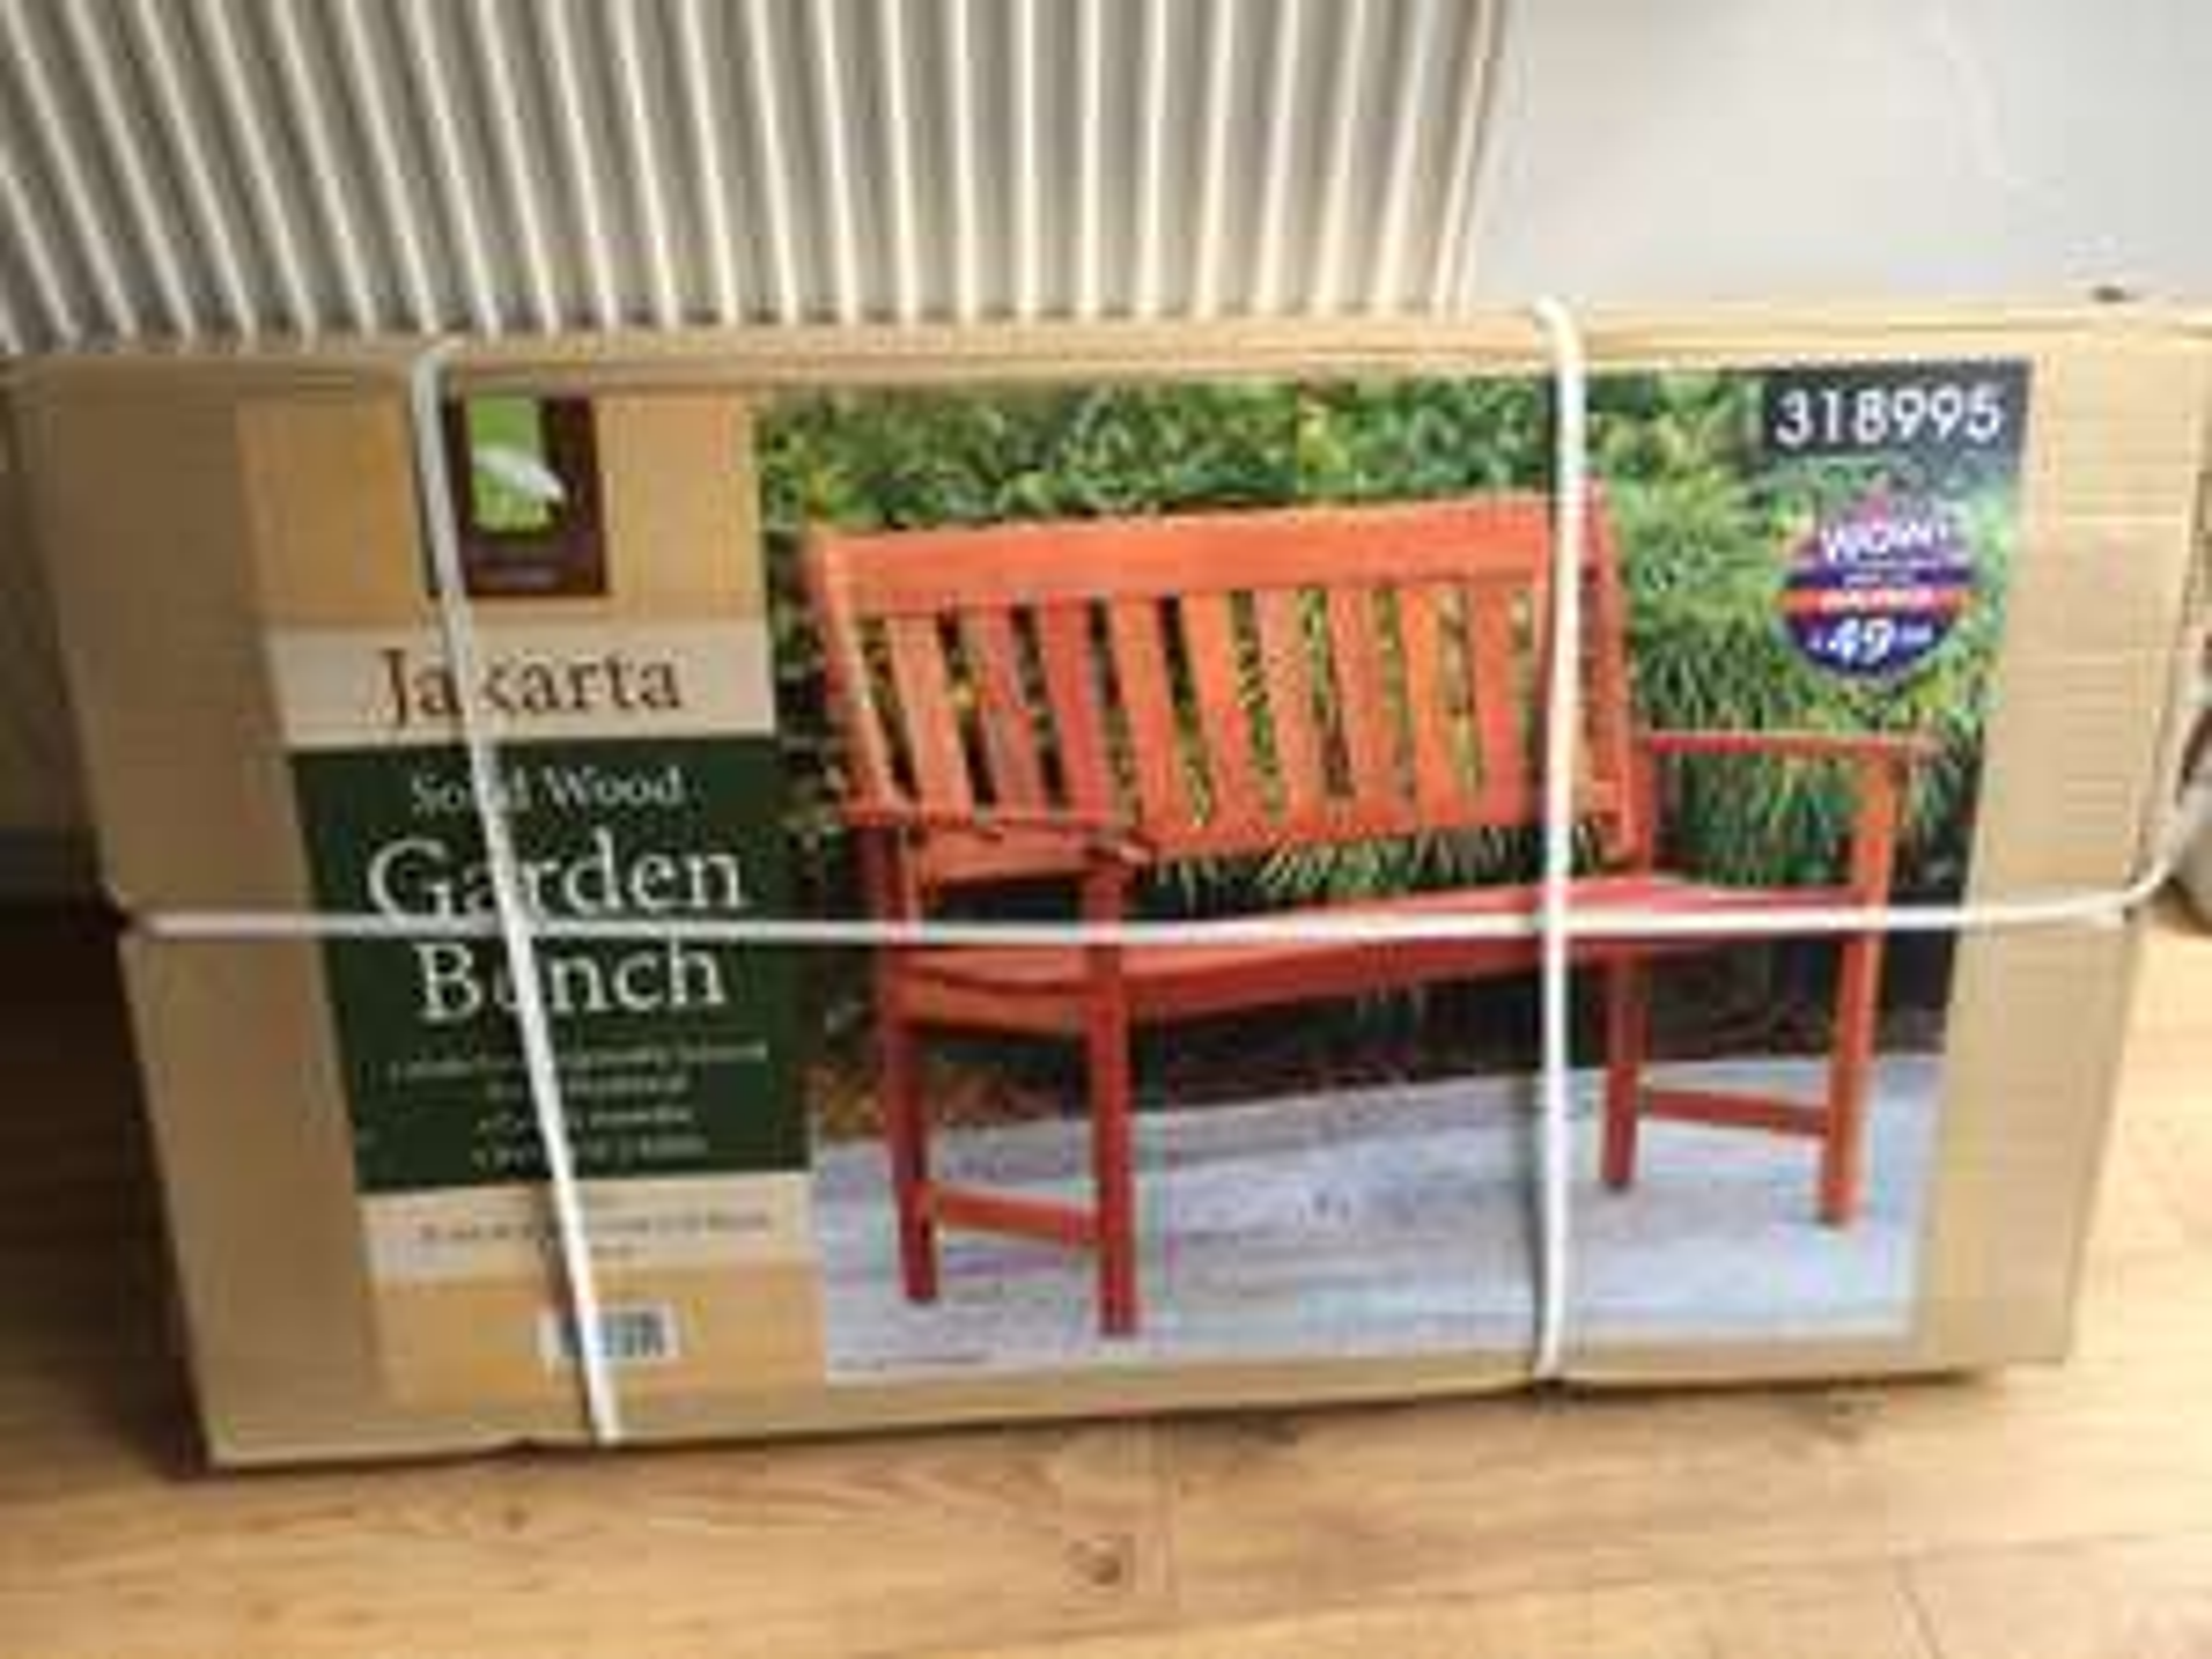 Hardwood garden bench £9.99 from B+M